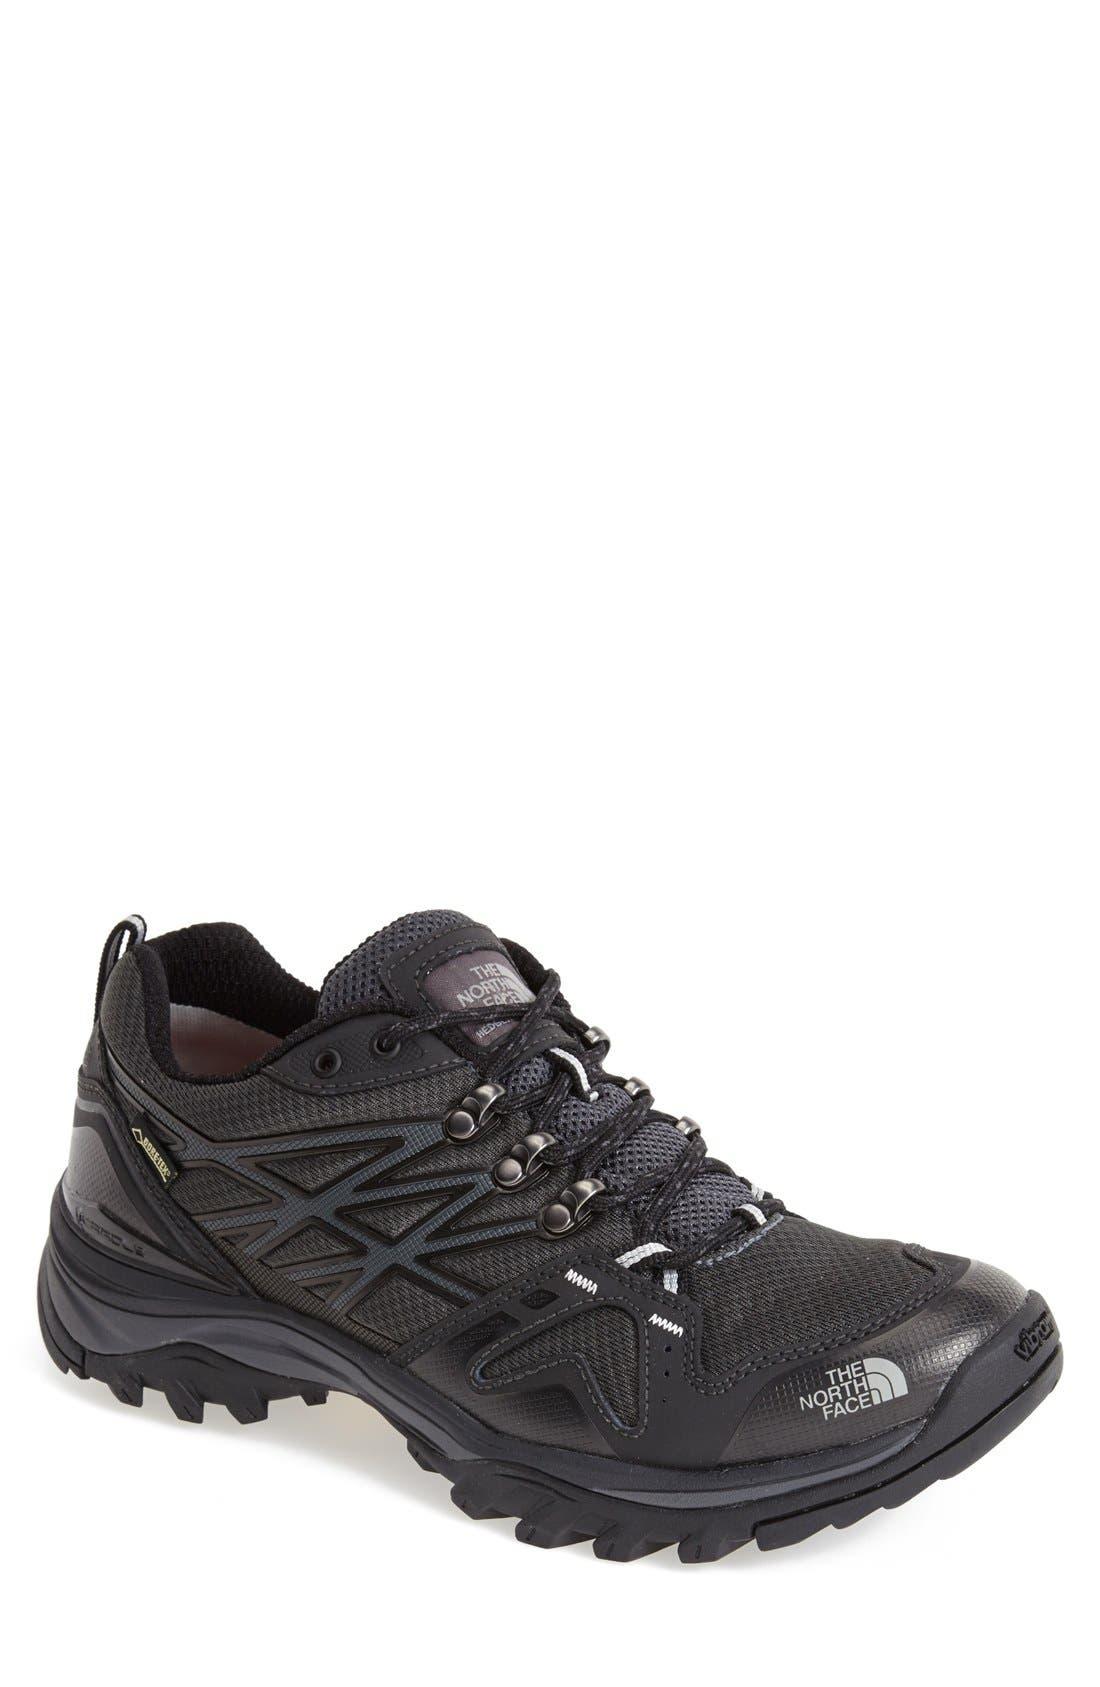 Alternate Image 1 Selected - The North Face 'Hedgehog Fastpack' Gore-Tex® Waterproof Hiking Shoe (Men)